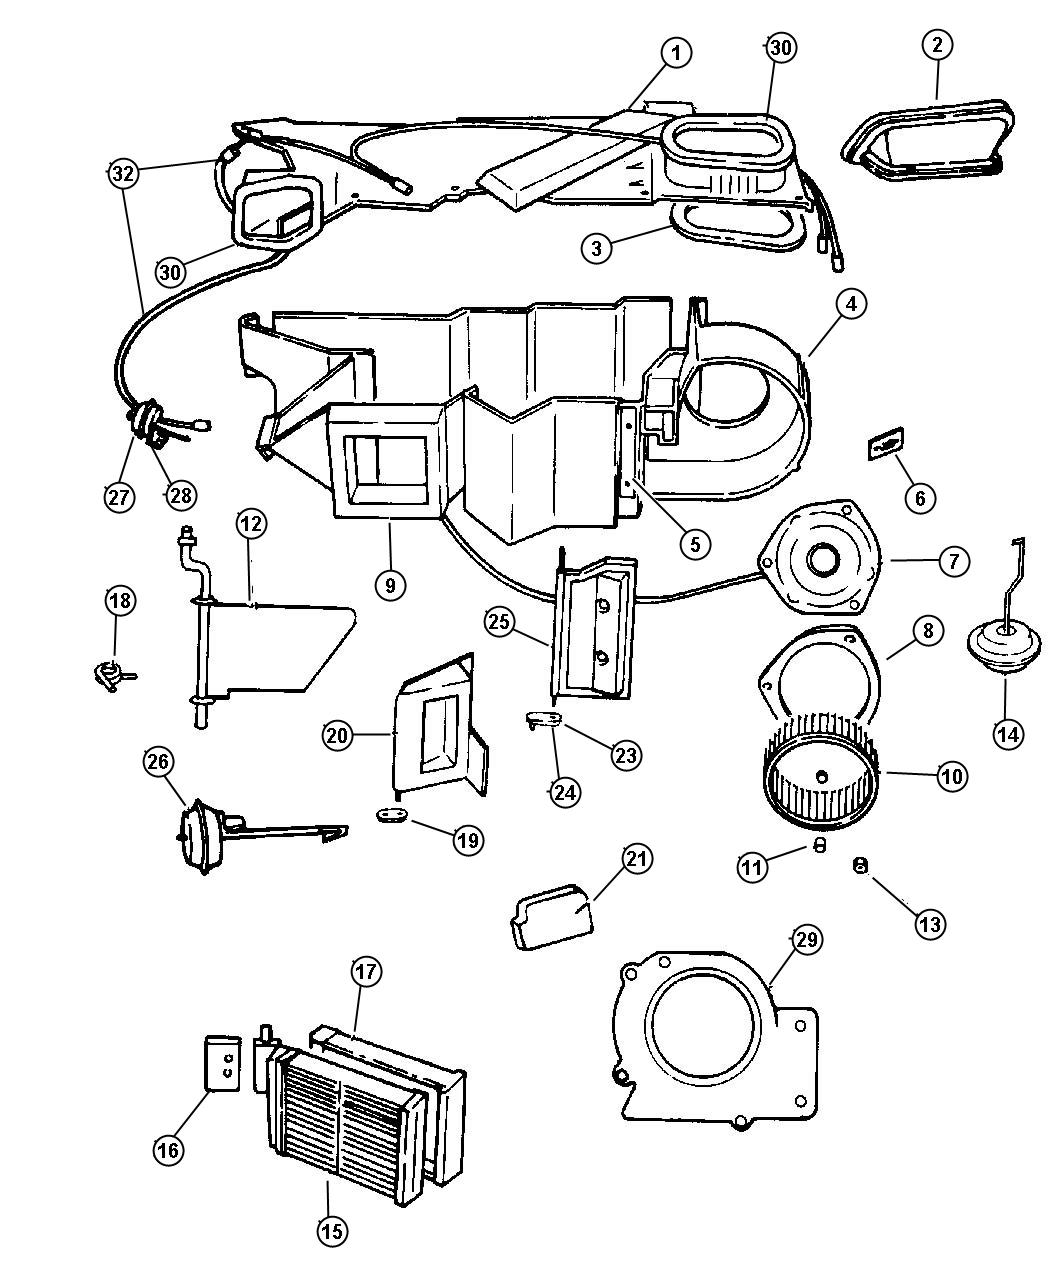 Diagram Jeep Cherokee Heater Diagram Full Version Hd